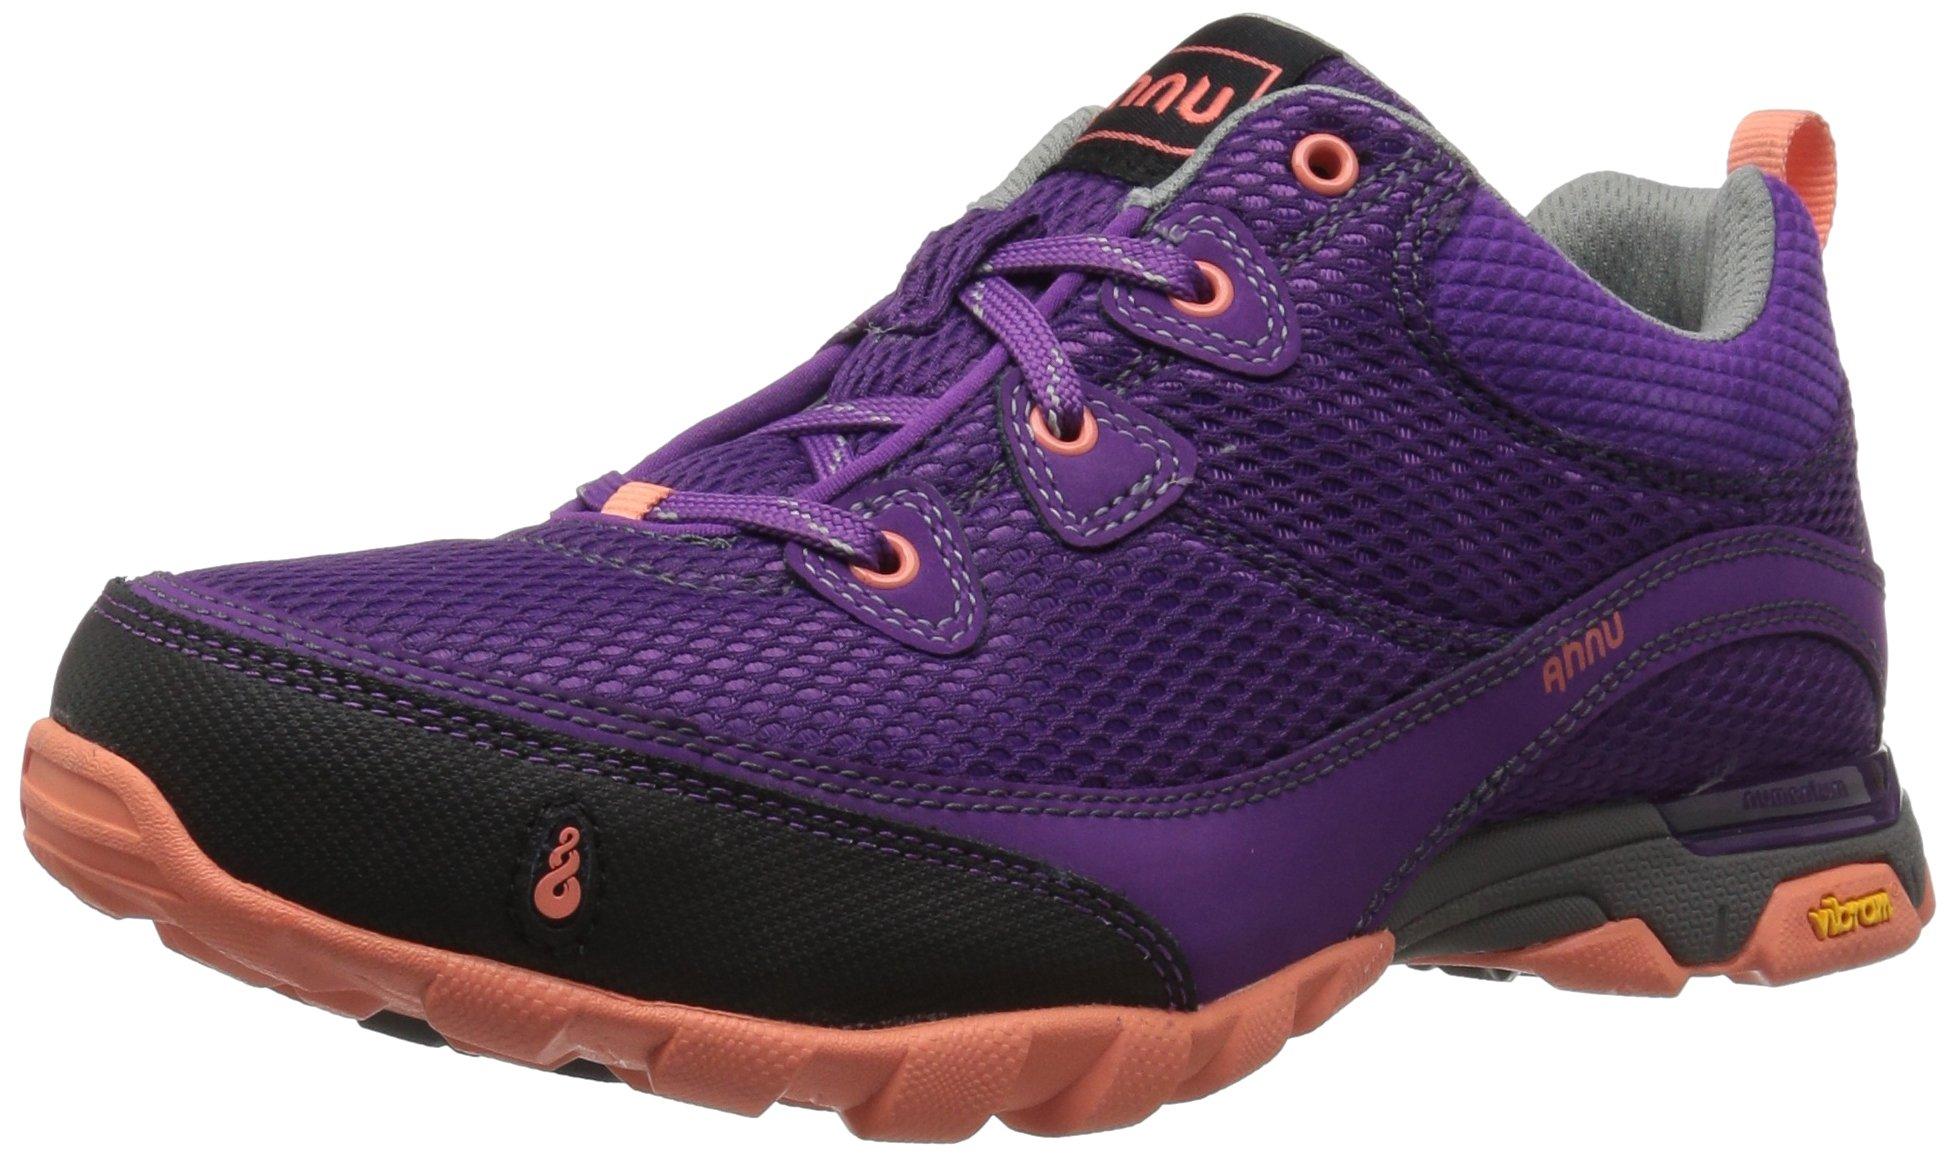 Ahnu Women's W Sugarpine Air Mesh Hiking Shoe, Bright Plum, 9 M US